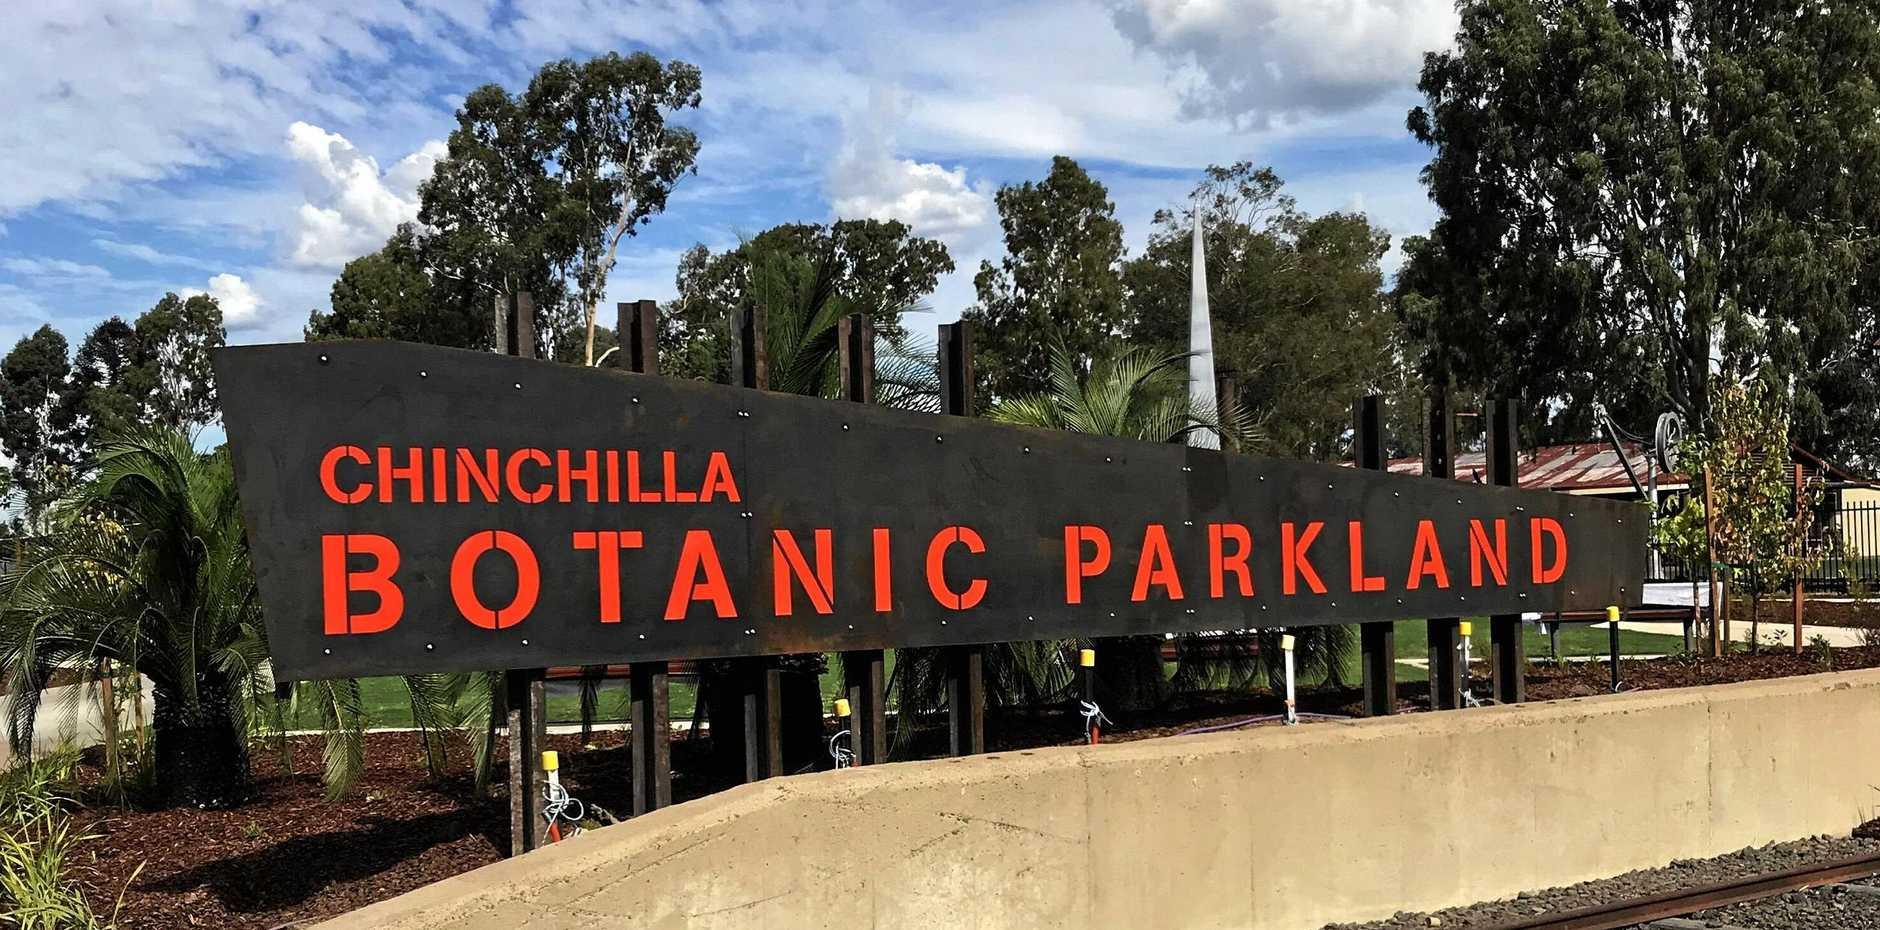 Chinchilla Botanic Parkland entry.